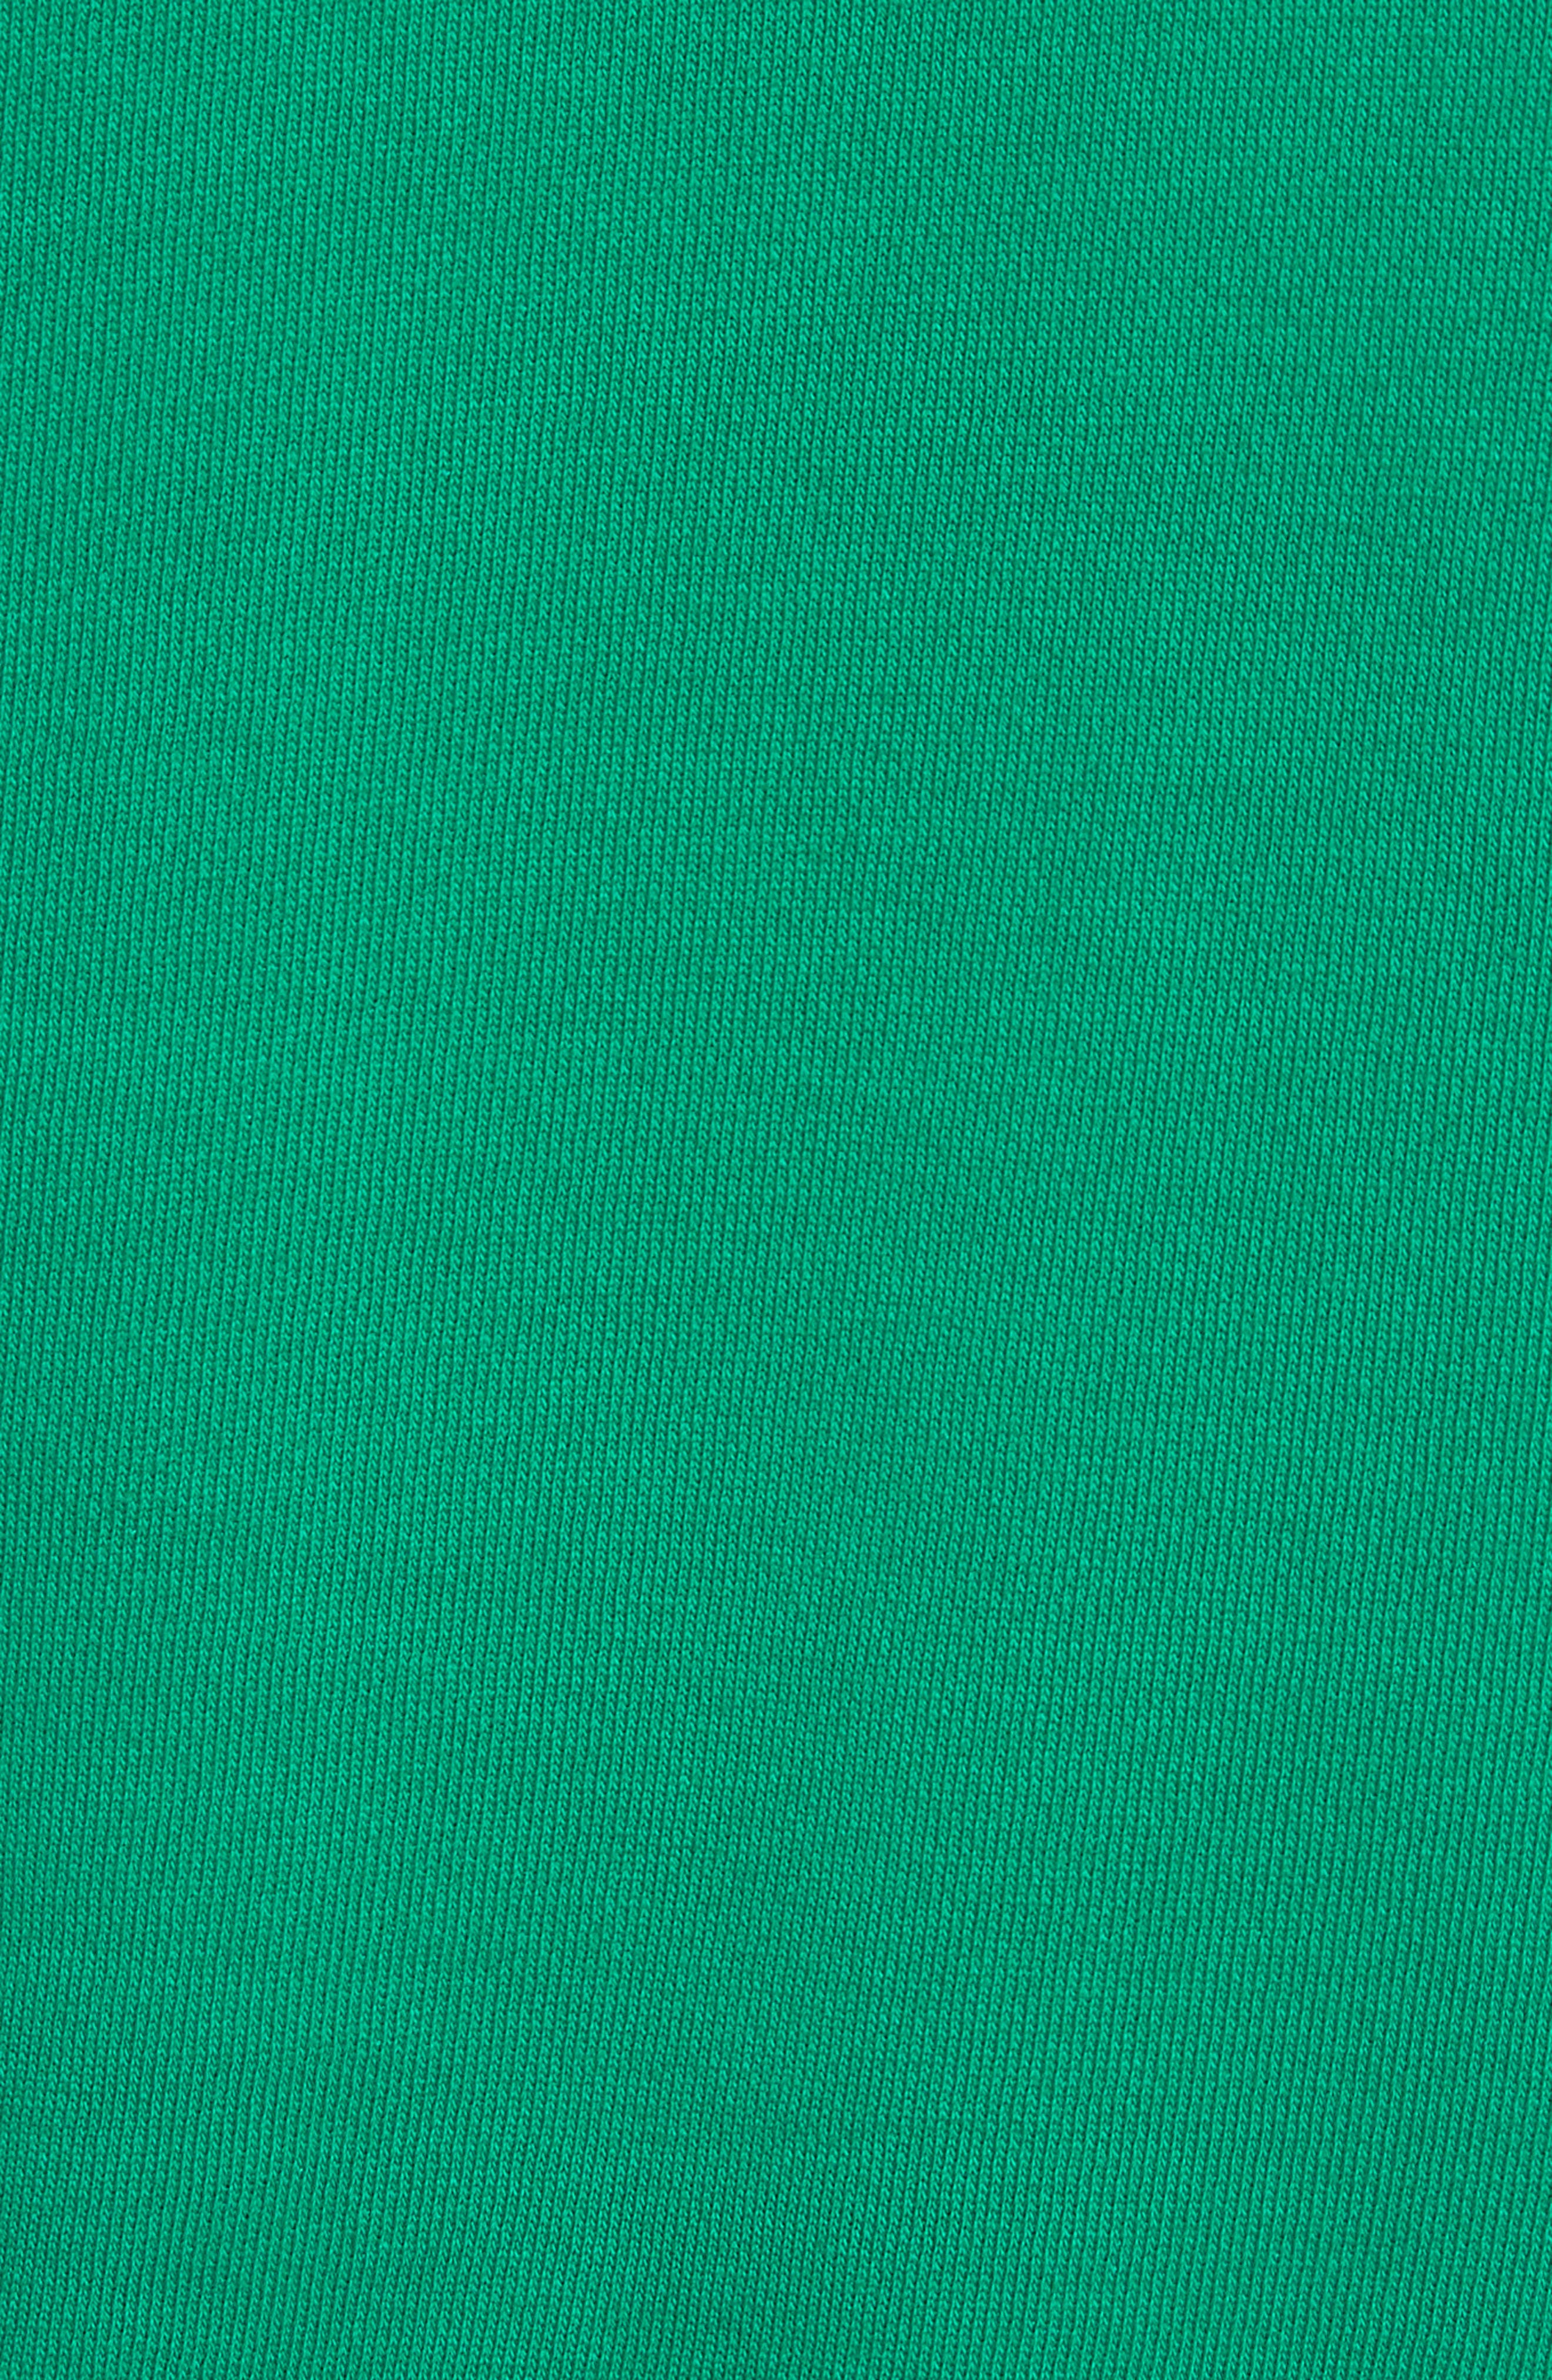 Isabel Marant Étoile Malibu Hoodie,                             Alternate thumbnail 4, color,                             Green